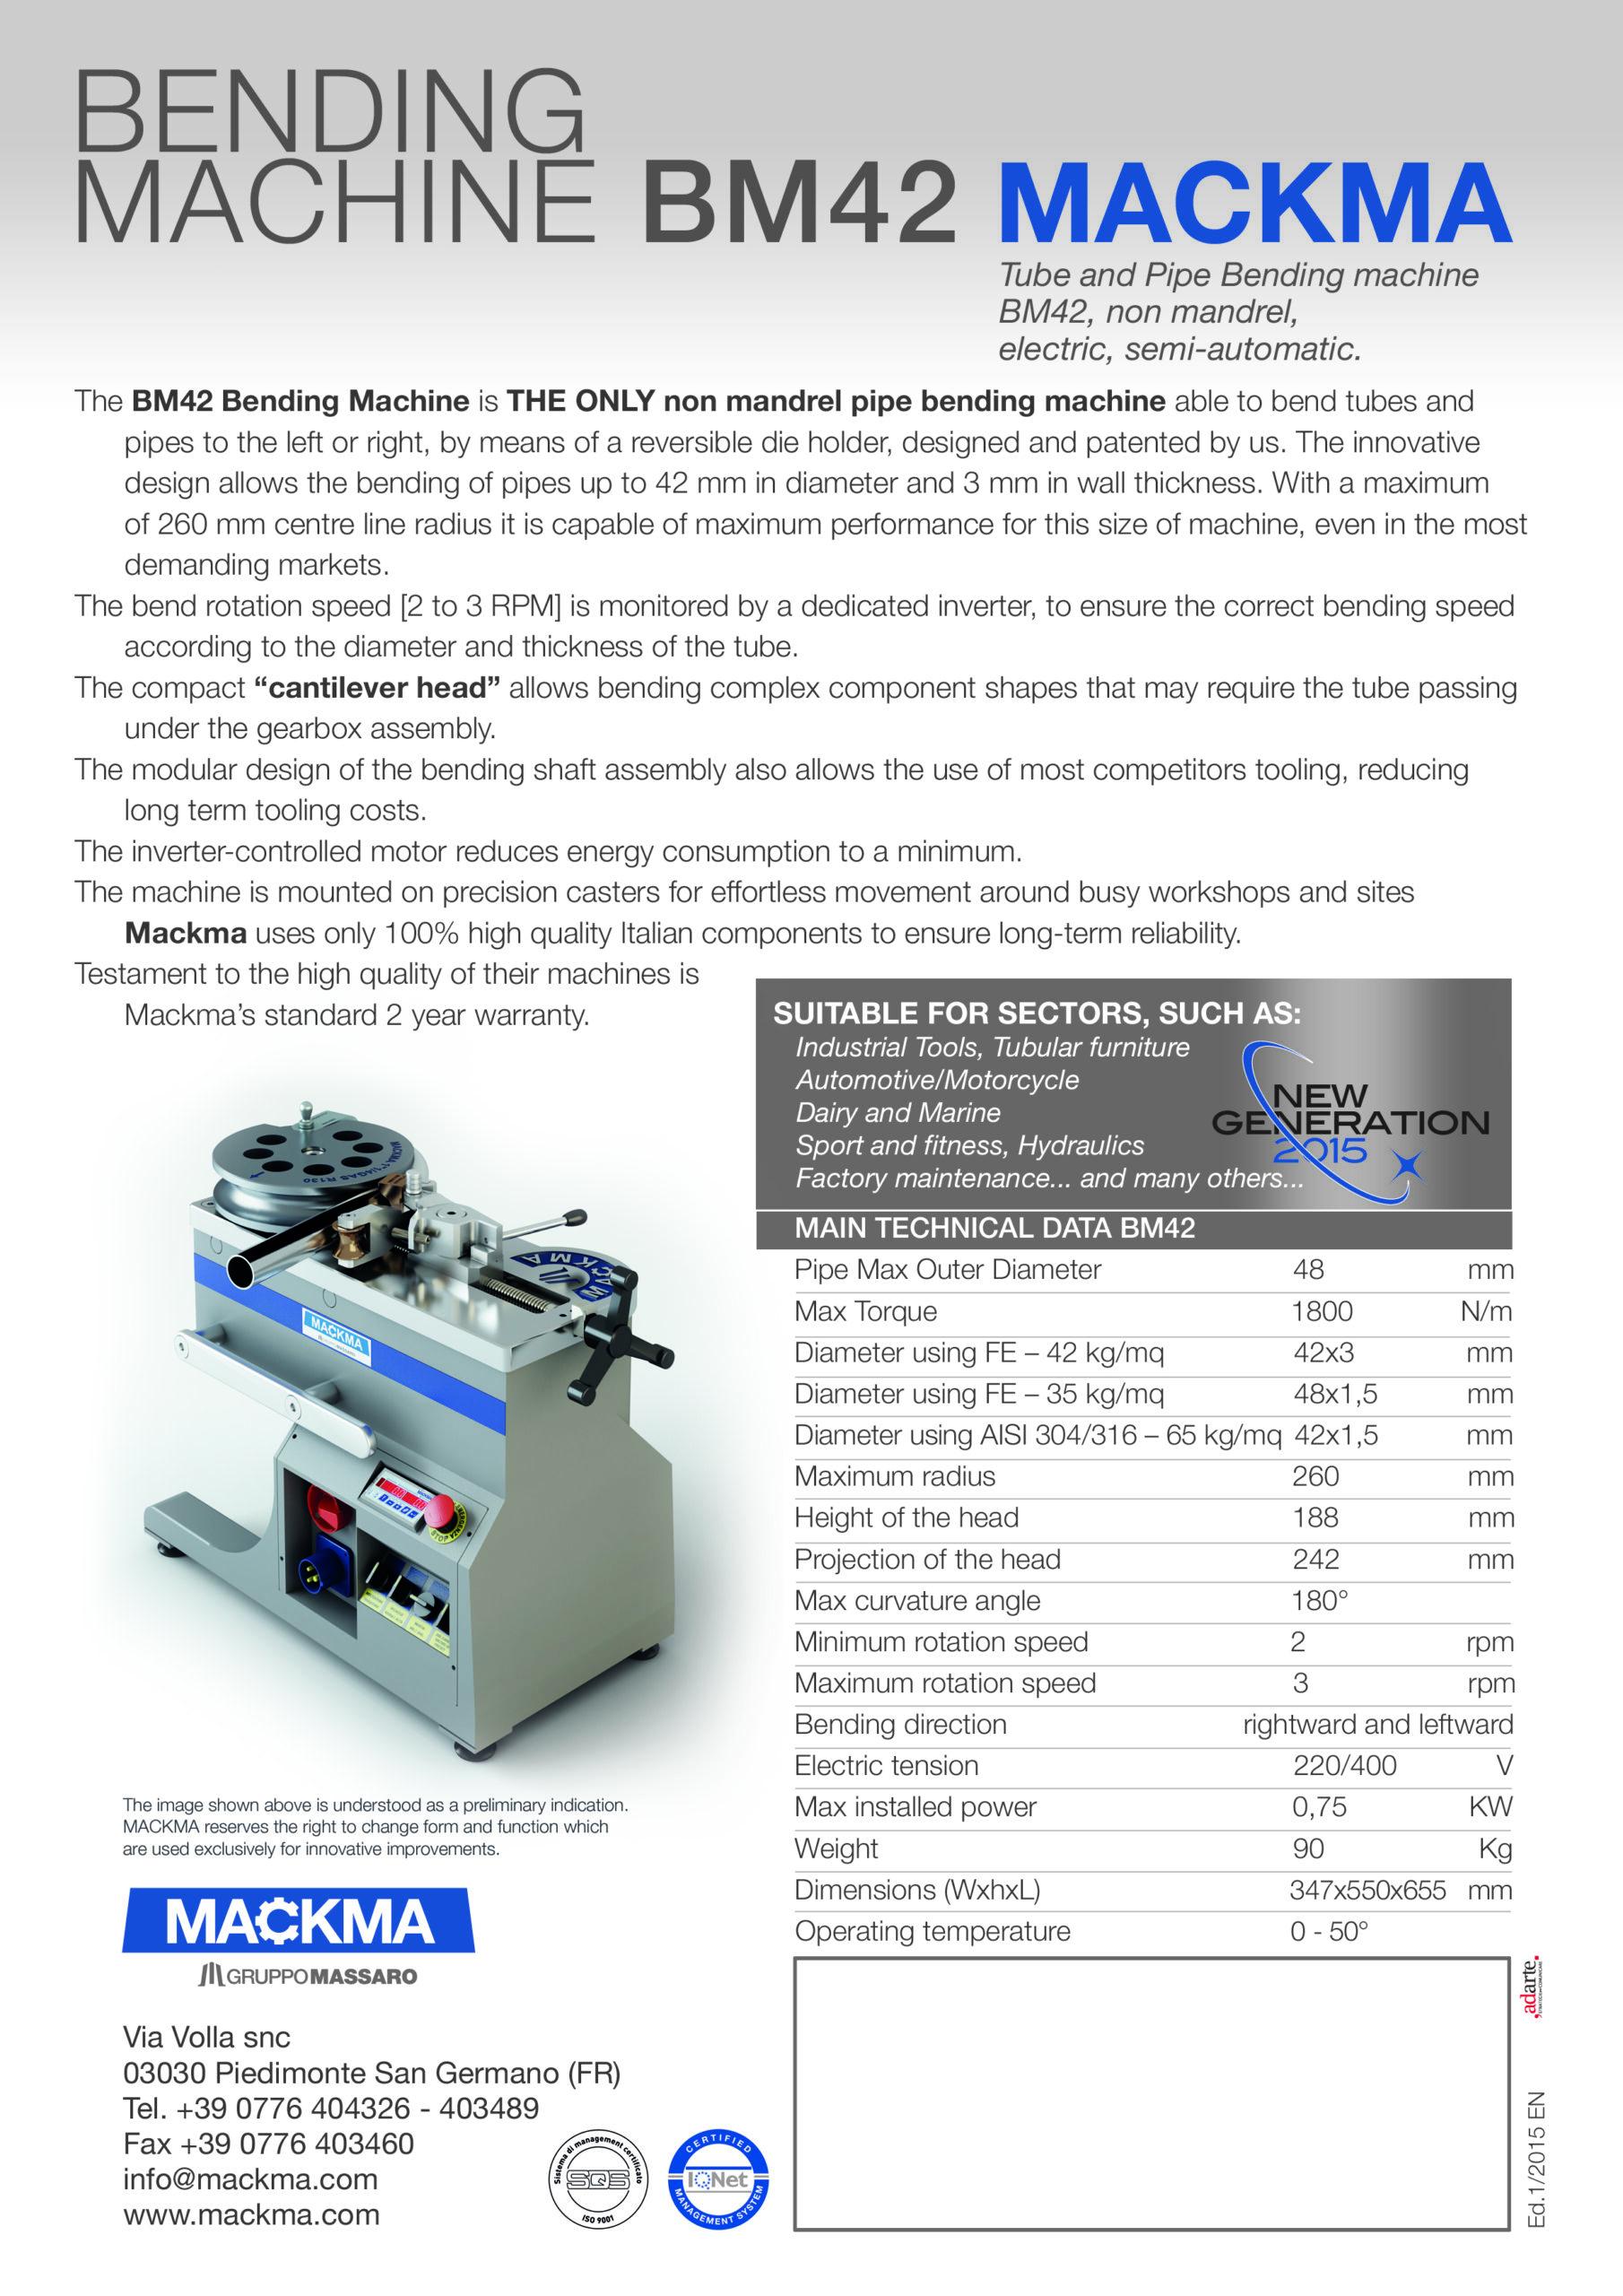 MACKMA - BM42 Non Mandrel Tube & Pipe Bender